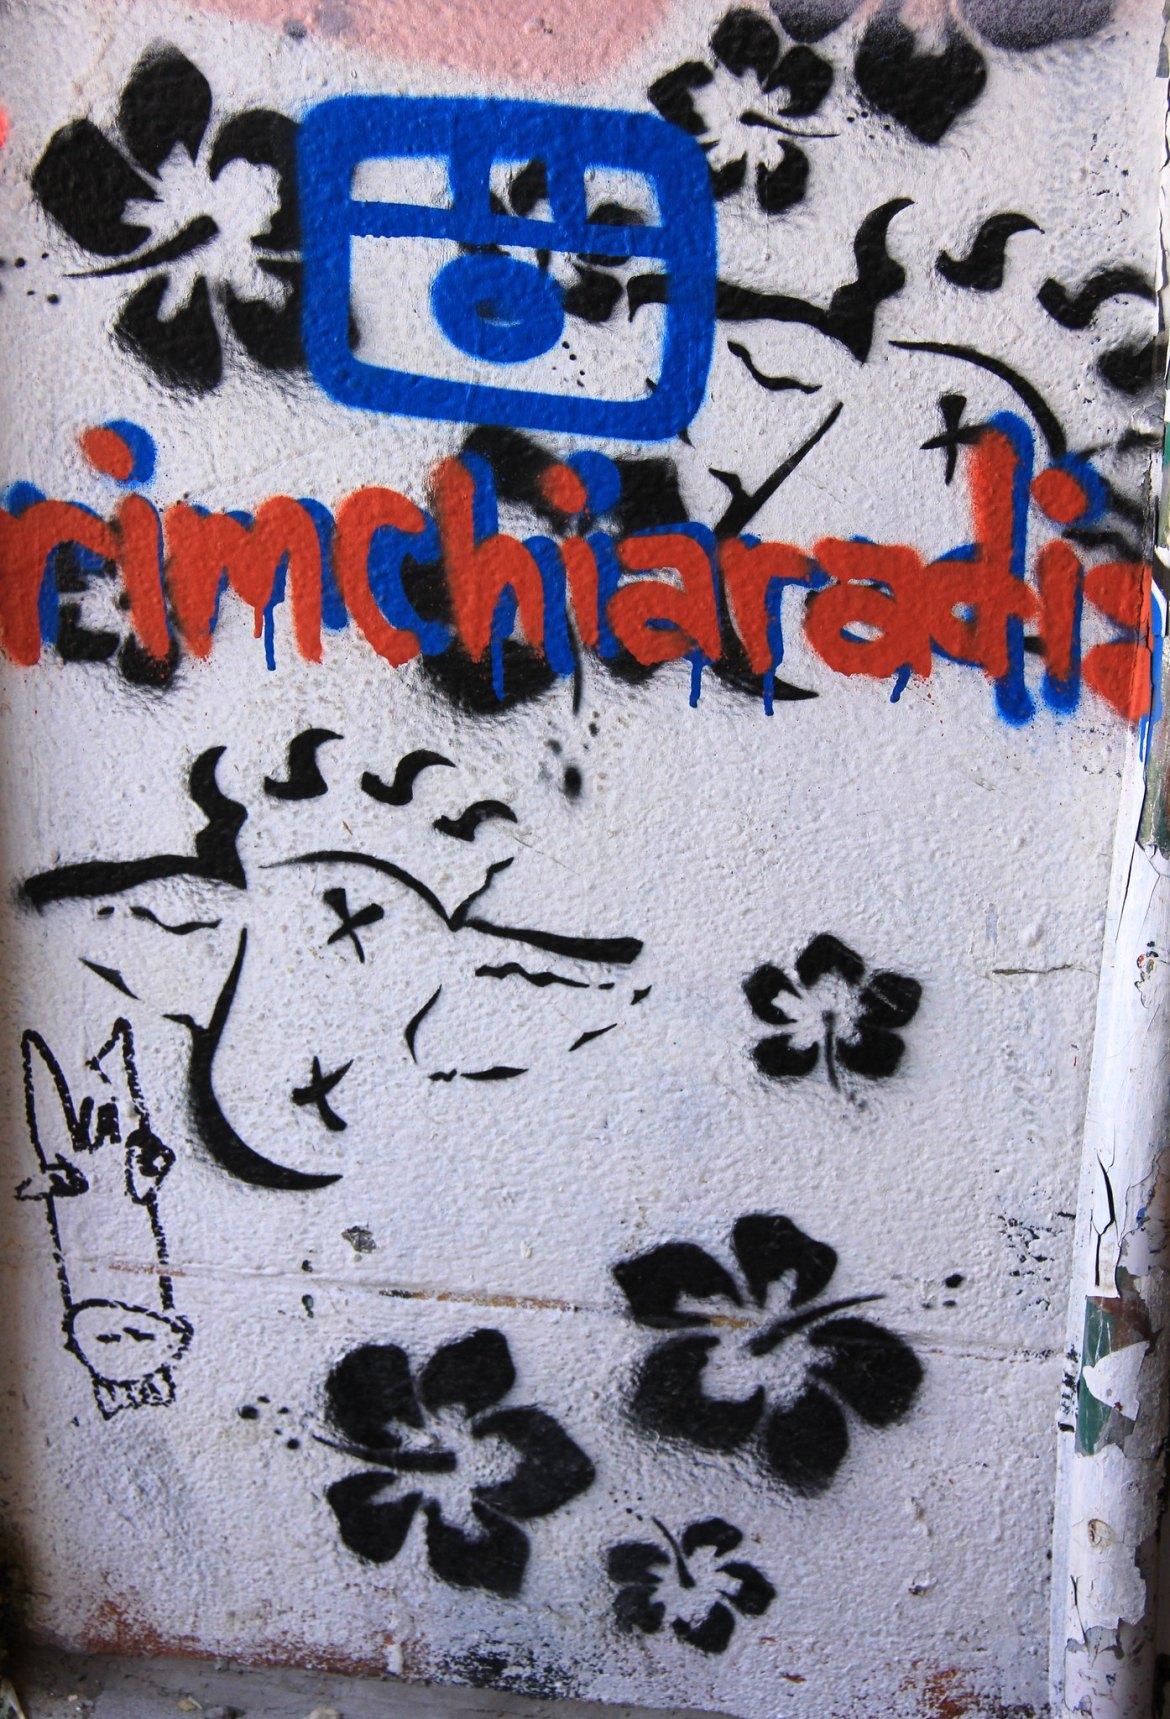 Graffiti Lane is must visit in Ghent